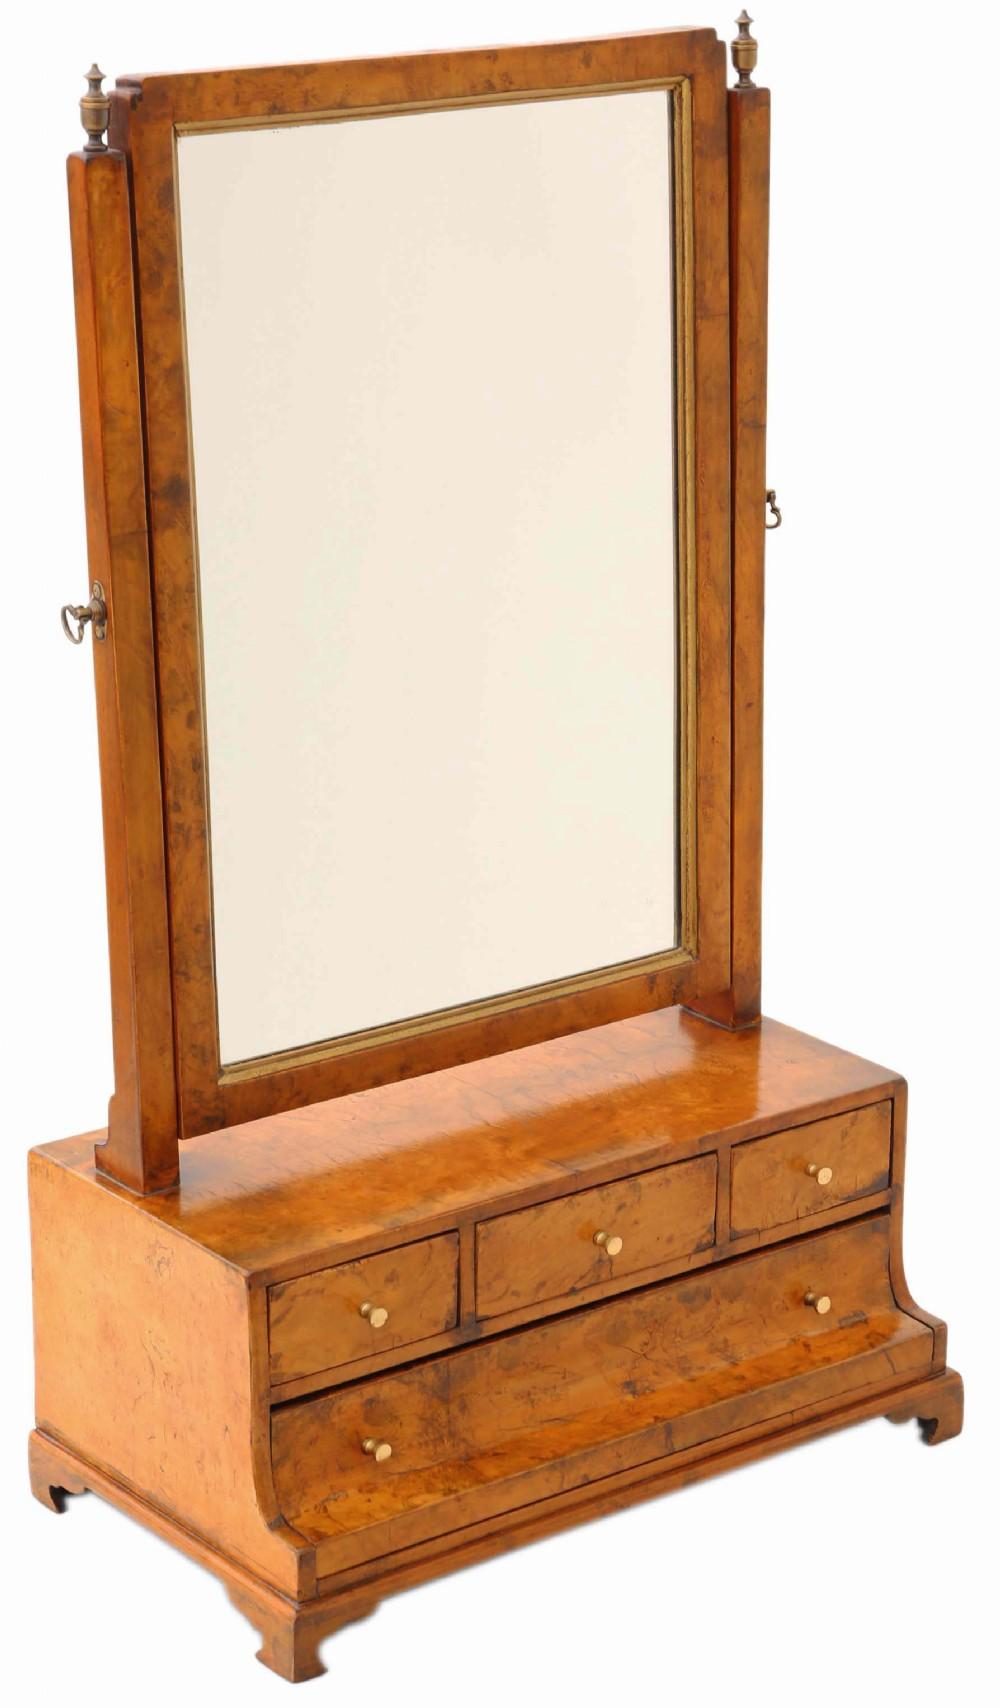 georgian burr walnut maple swing dressing table mirror